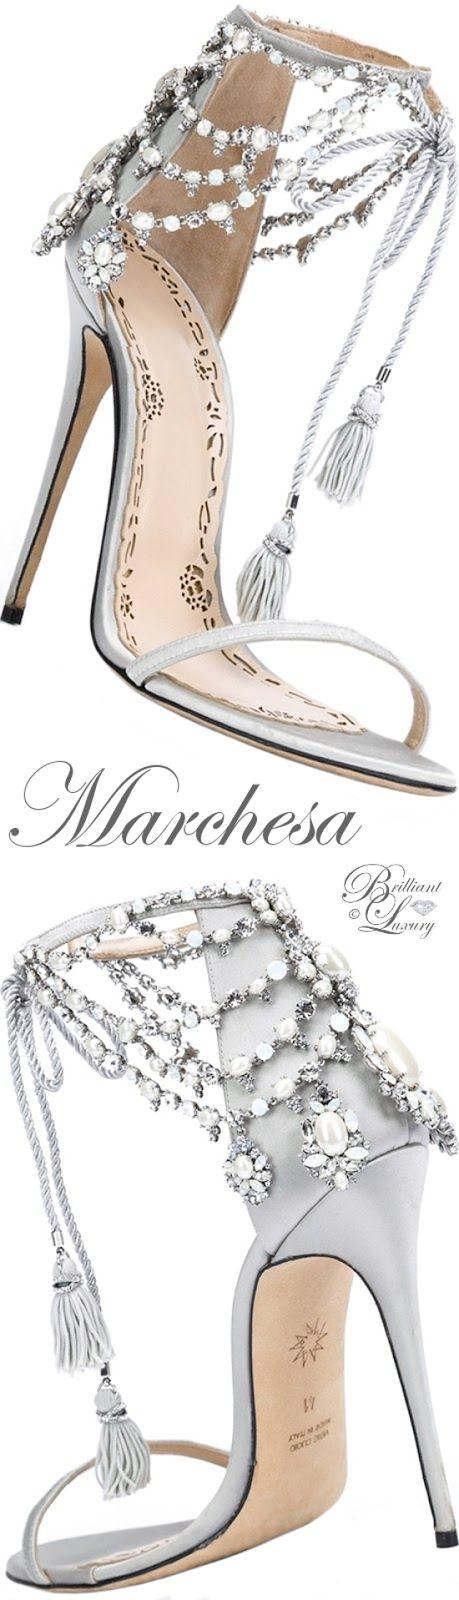 Brilliant Luxury ♦ Marchesa Marissa Sandal